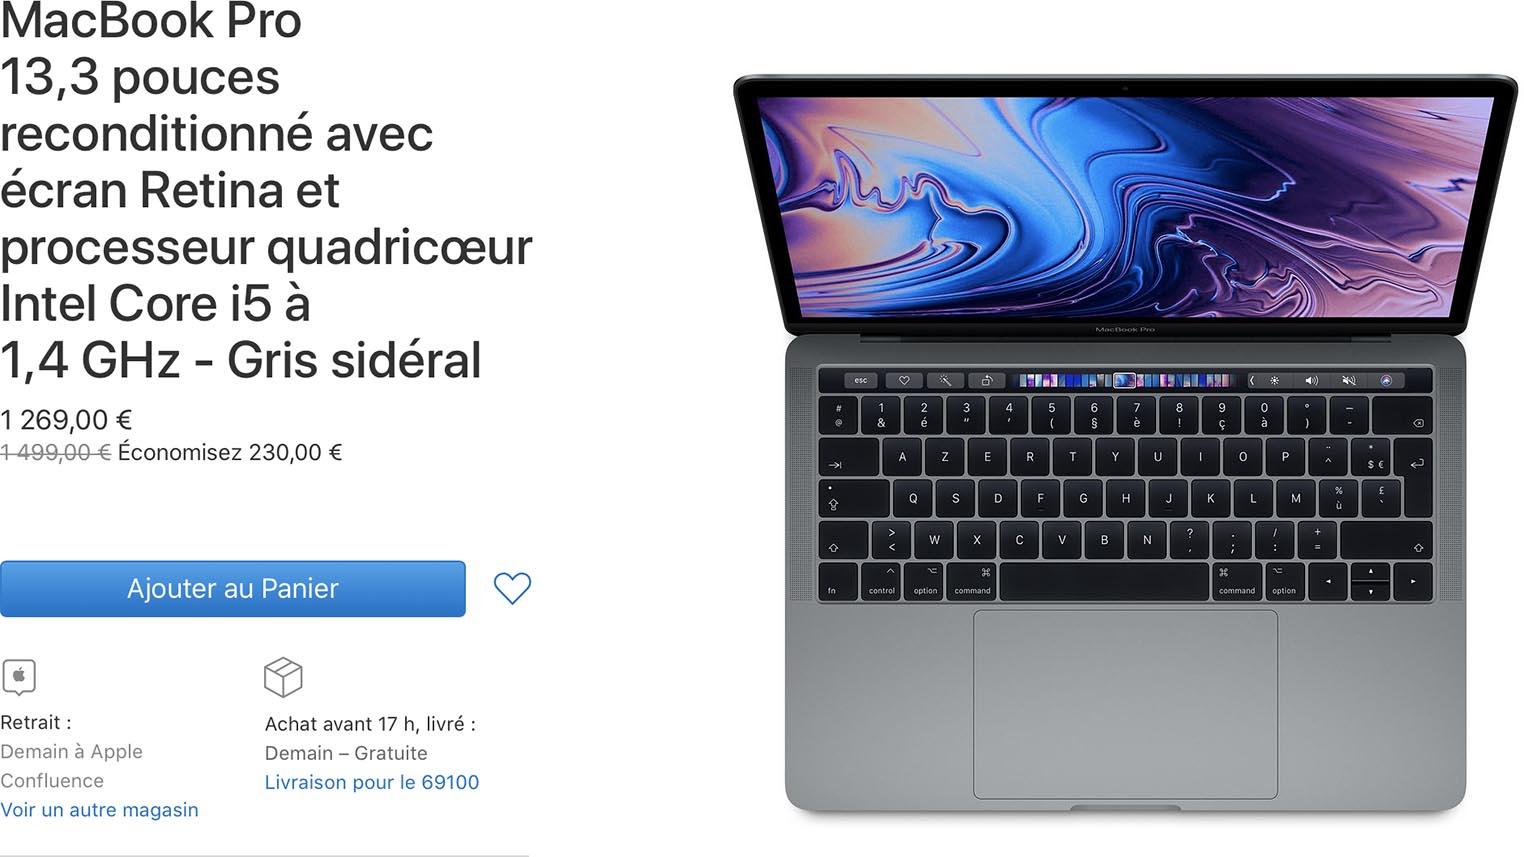 MacBook Pro 2019 Refurb